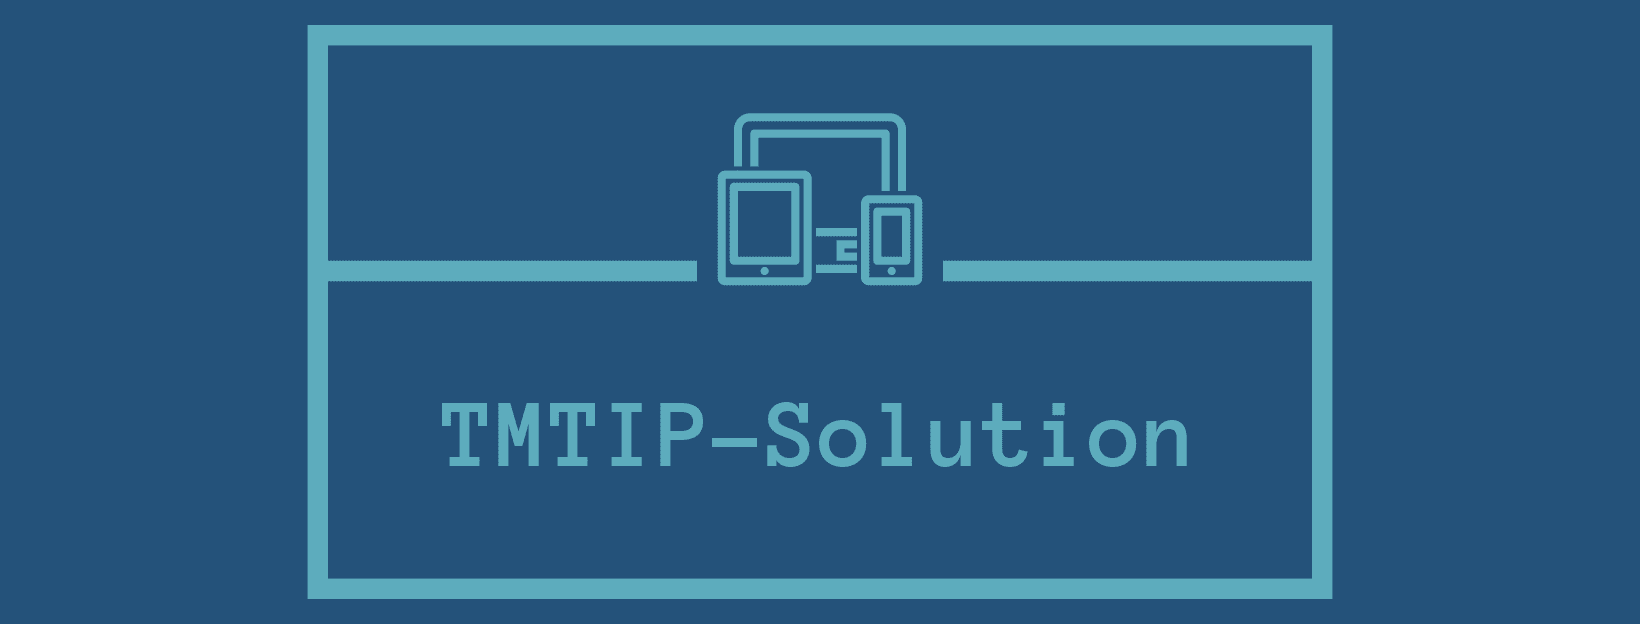 TMTIP-Solution